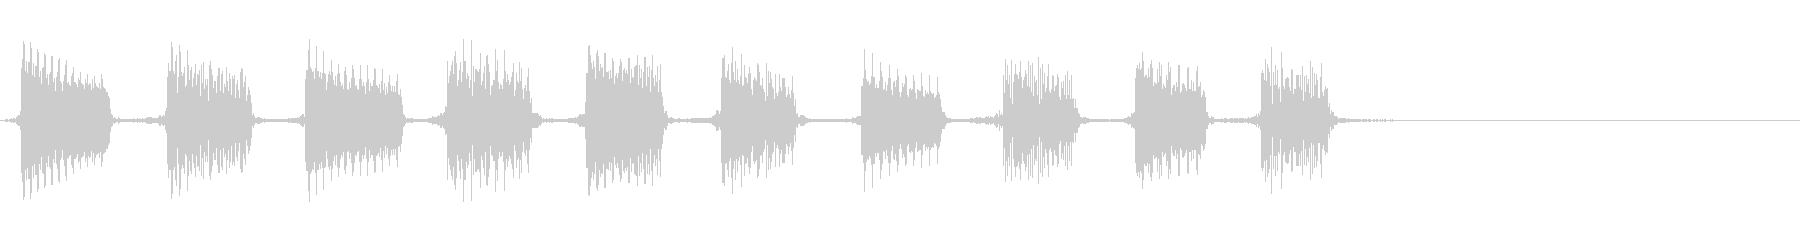 STEEL GUITAR:ロー・ツ...の未再生の波形